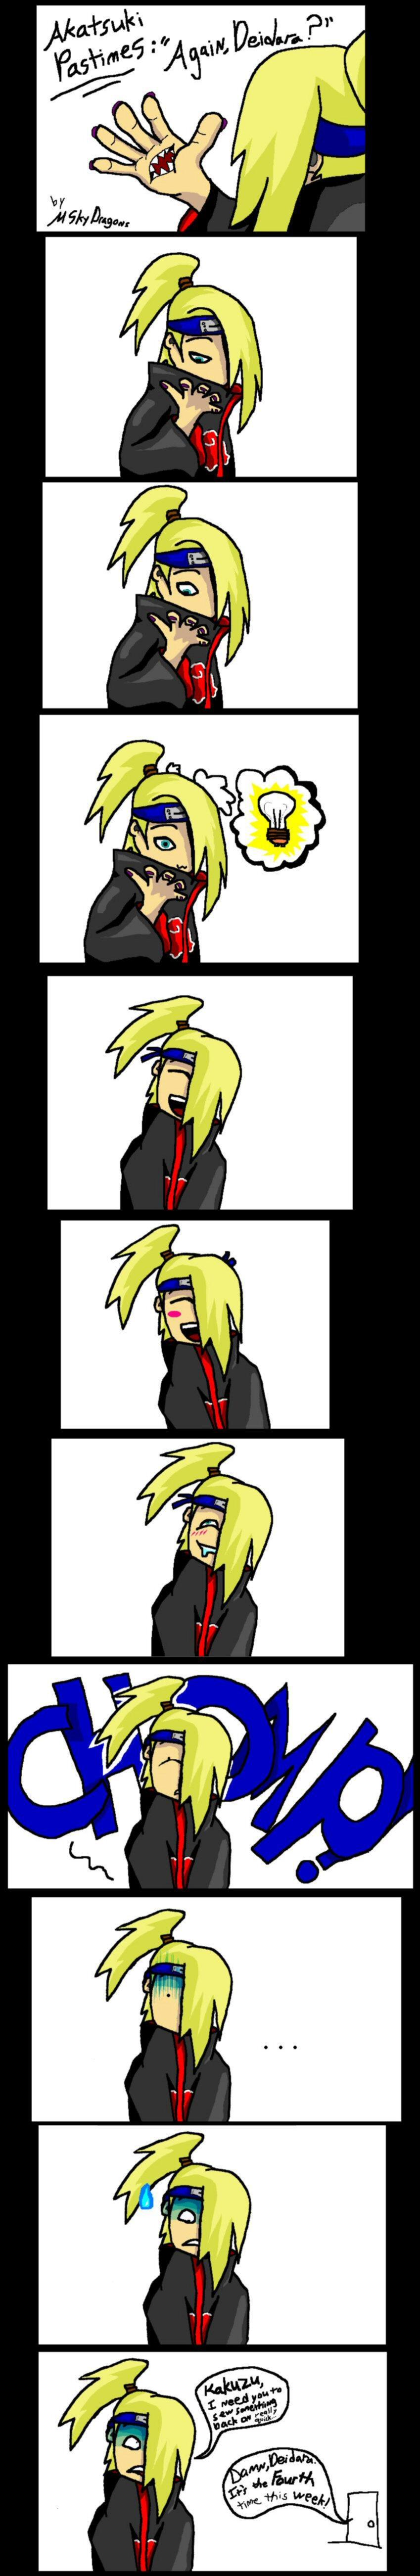 Naruto Fun Pics Akatsuki_Pastimes__Again__Dei__by_MSkyDragons